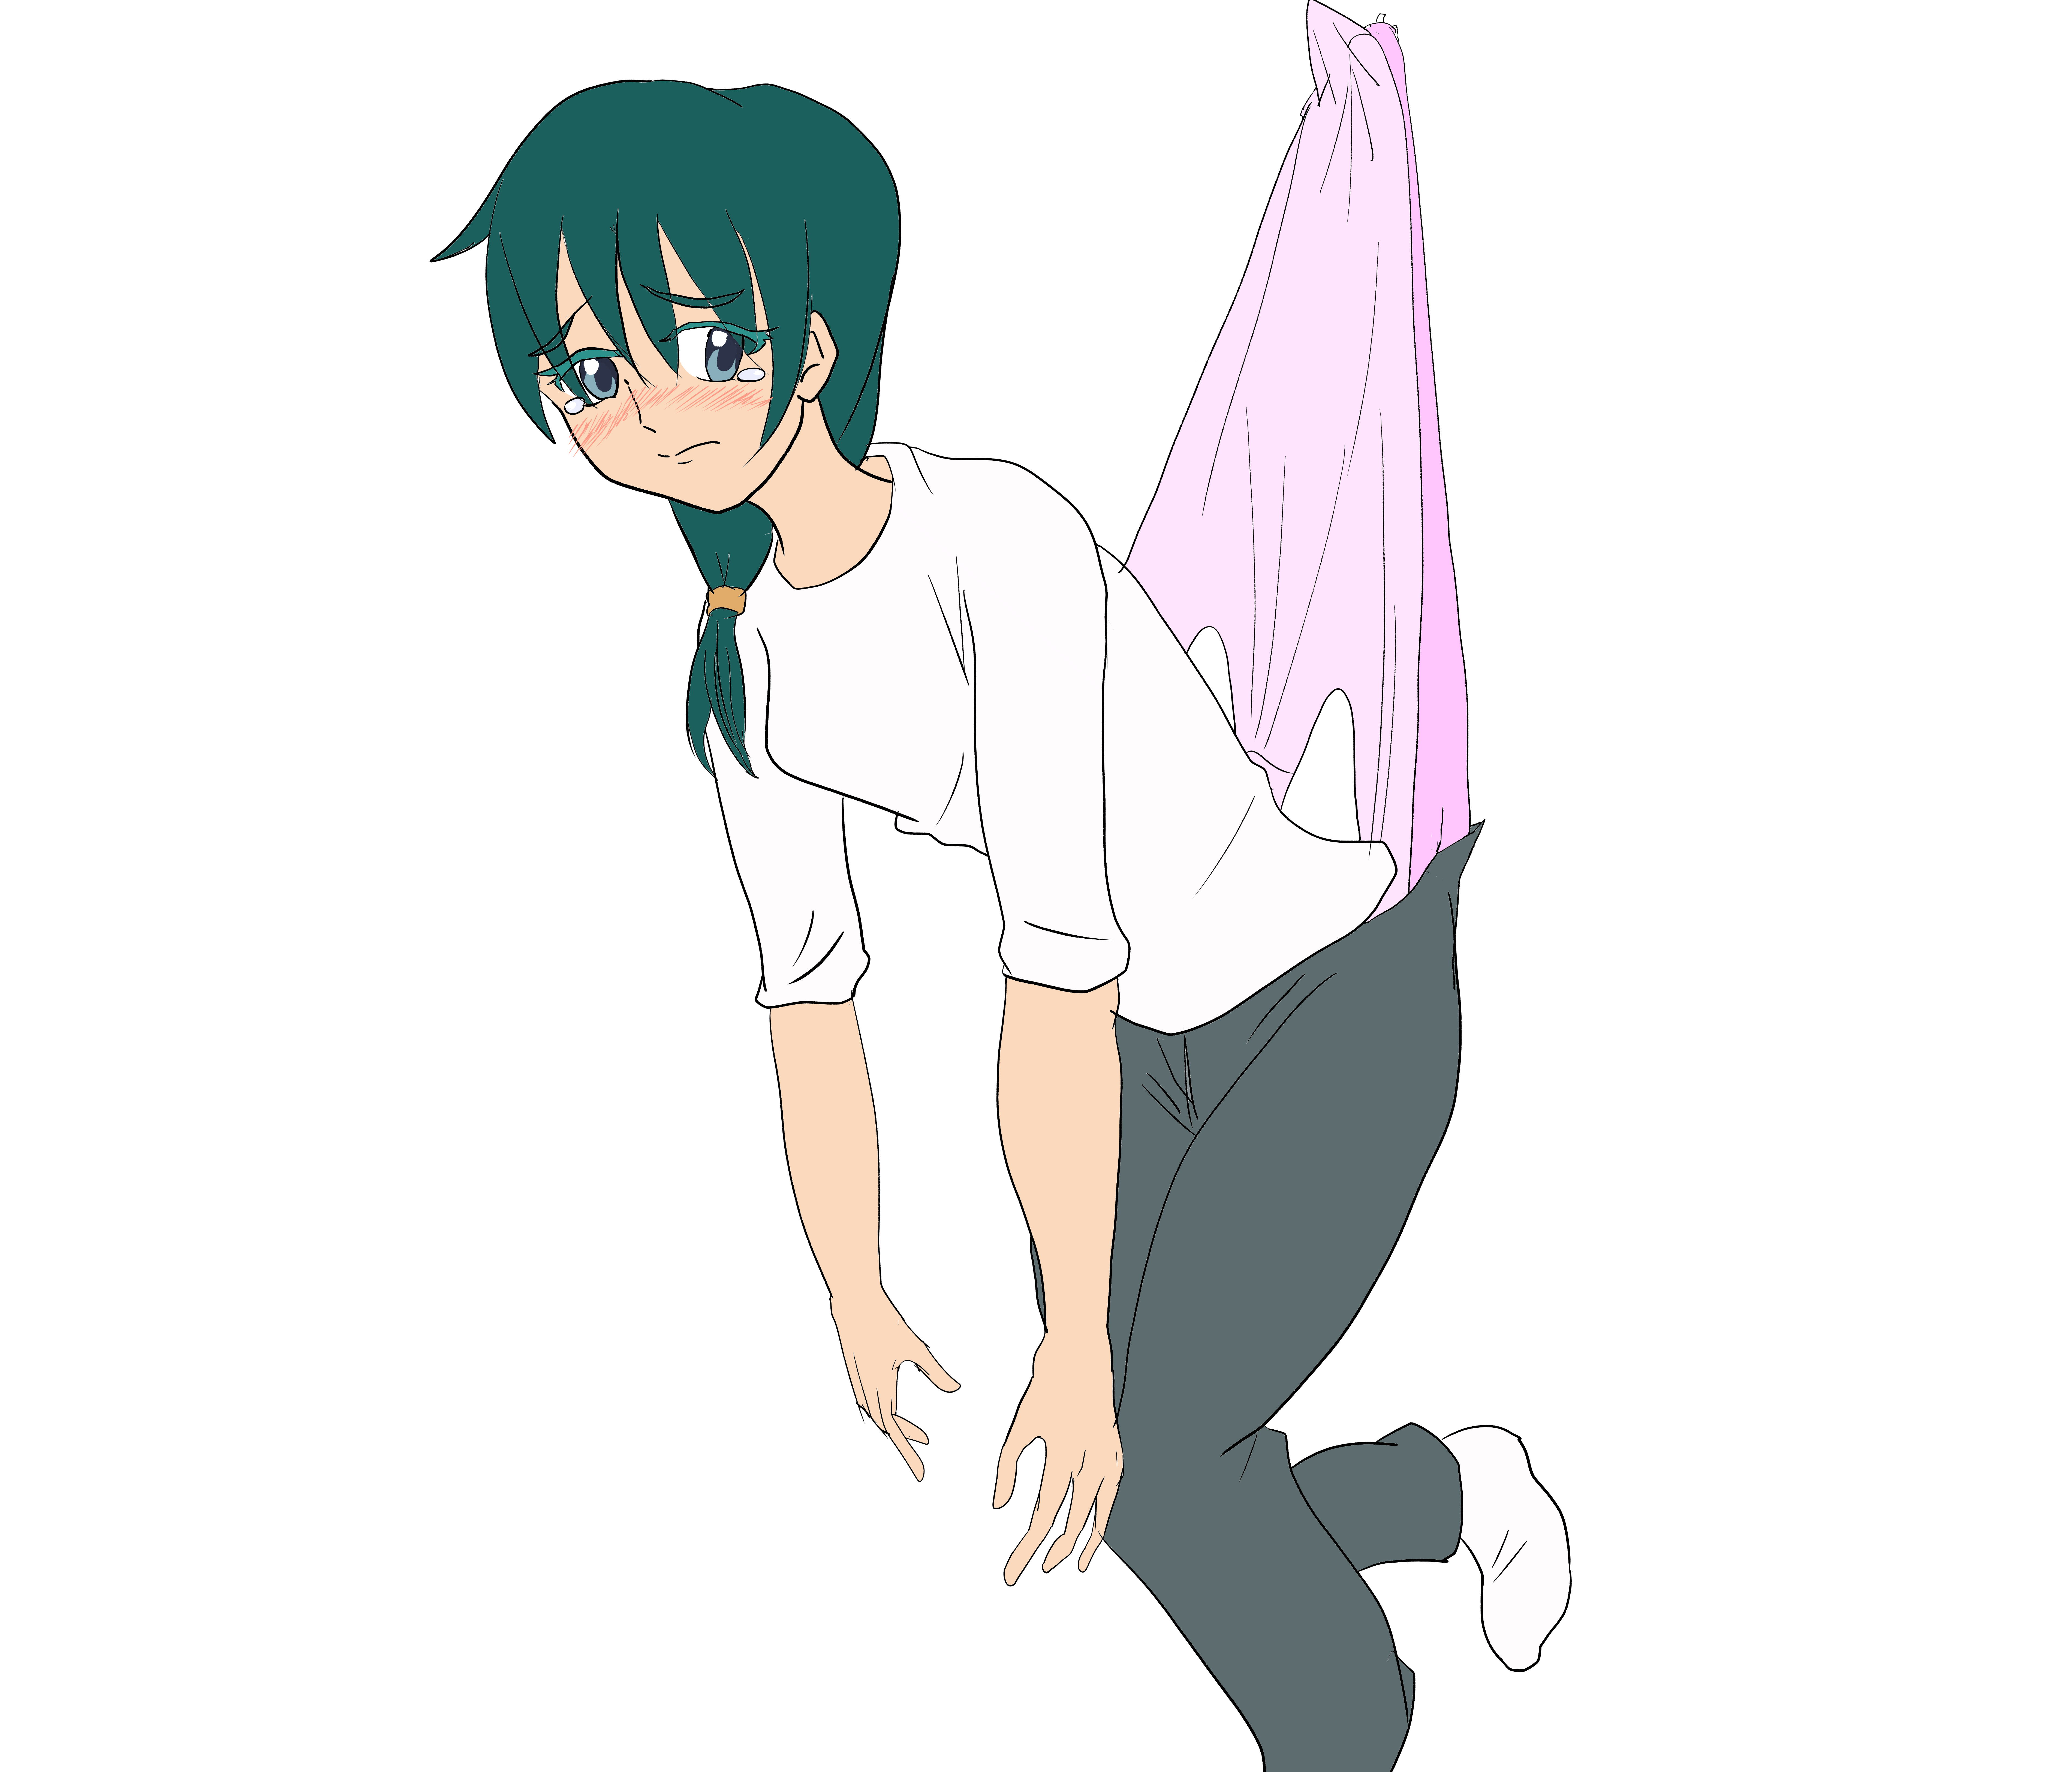 Anime girl wedgie very